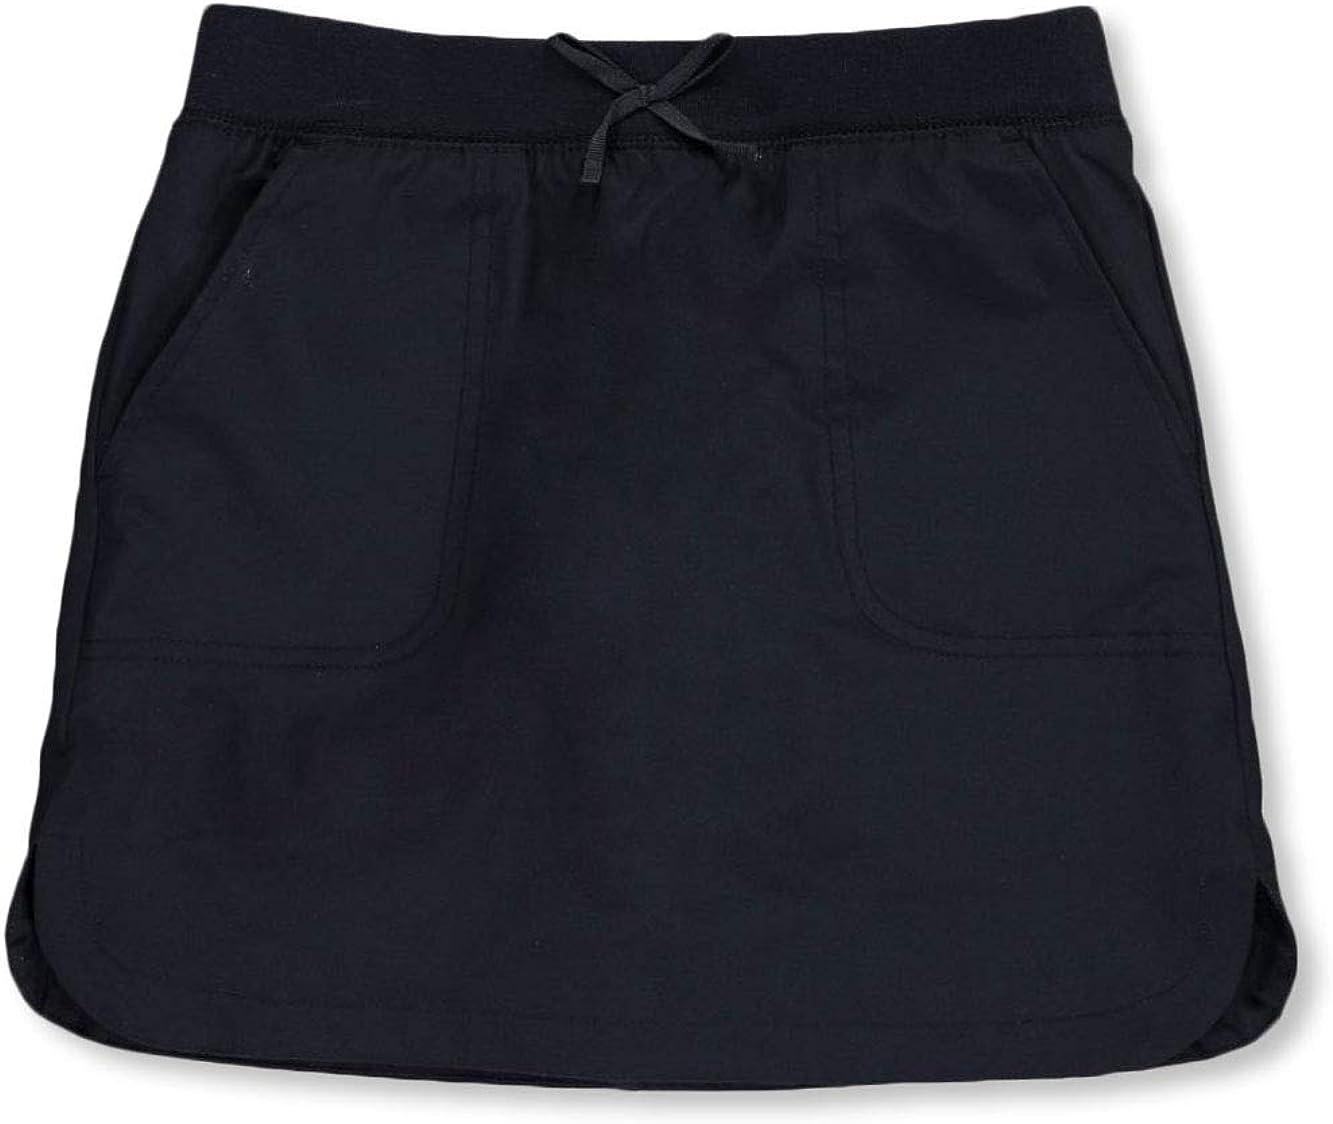 Nautica Girls School Uniform Patch Pocket Scooter Skirt